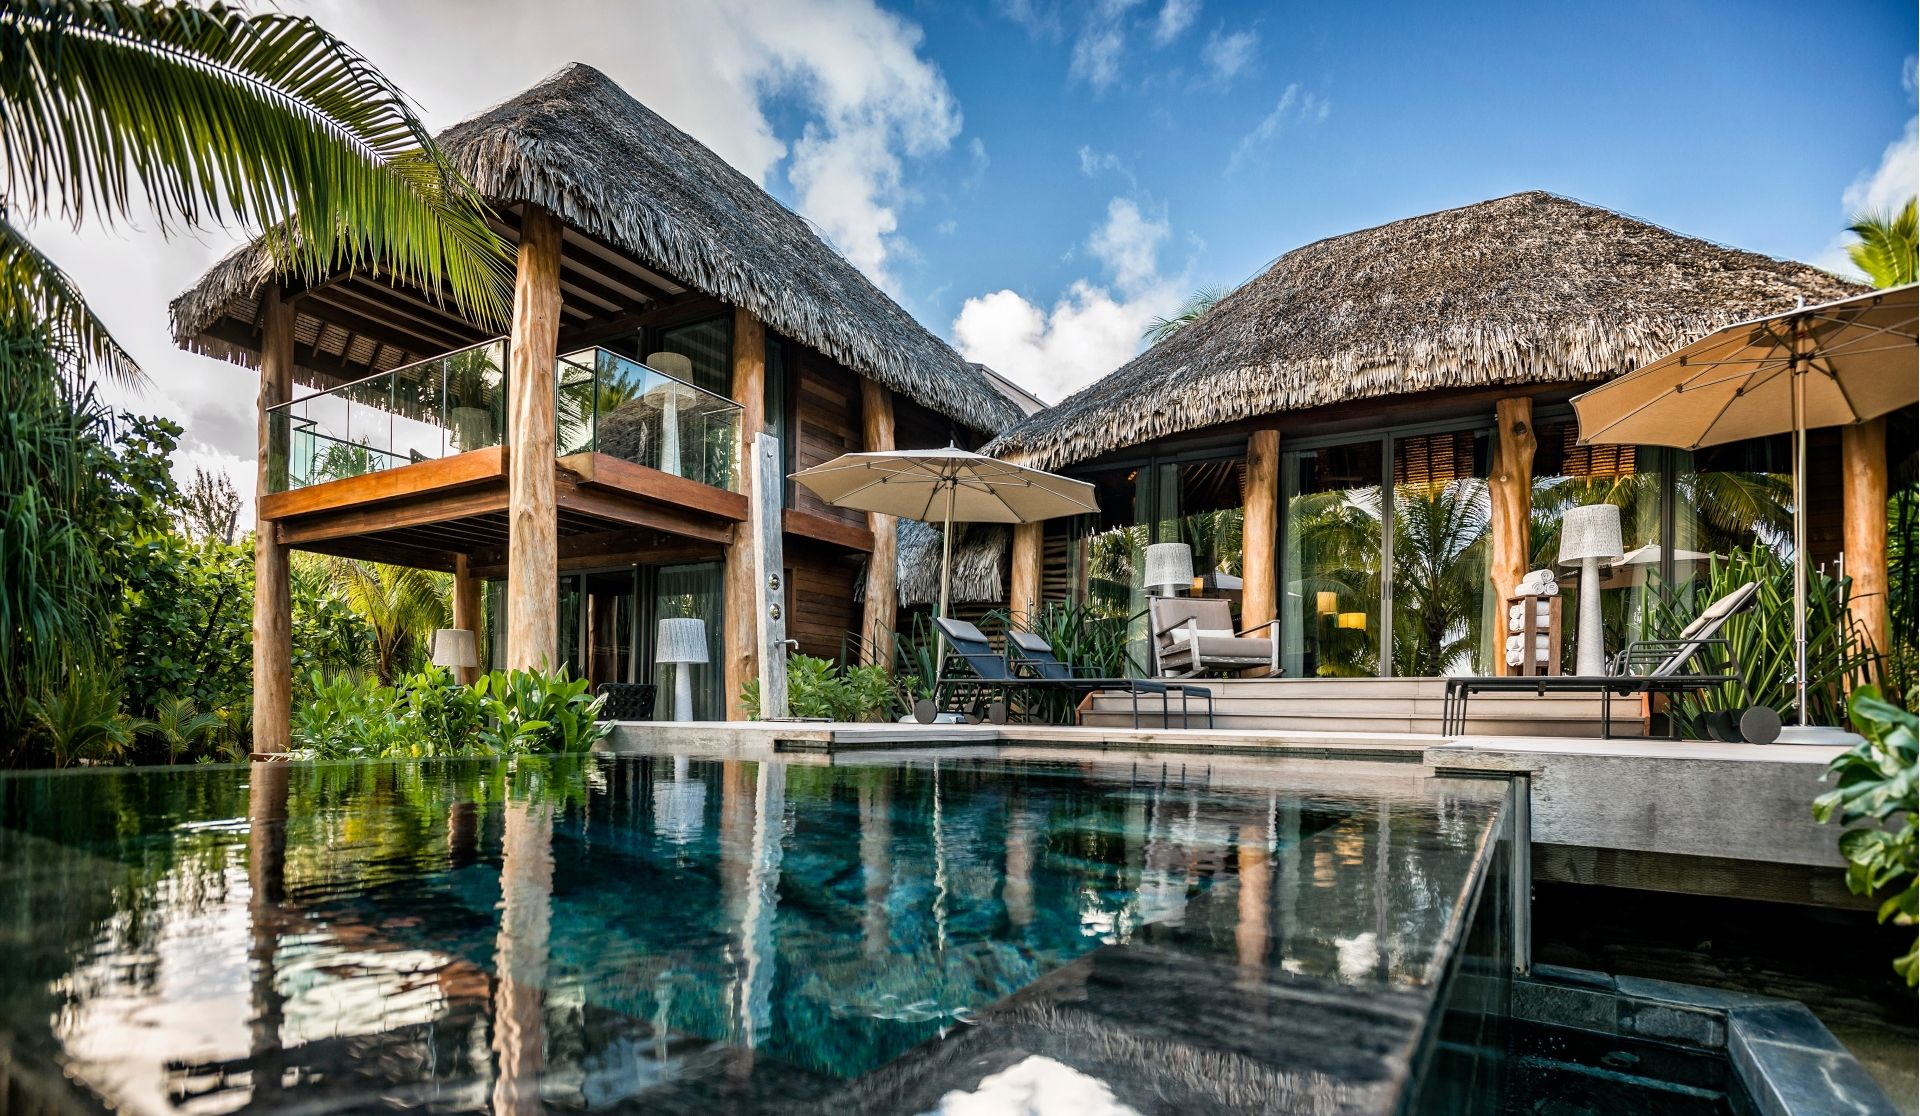 The Three bedroom Villa (Photo Credit – Romeo Balancourt)